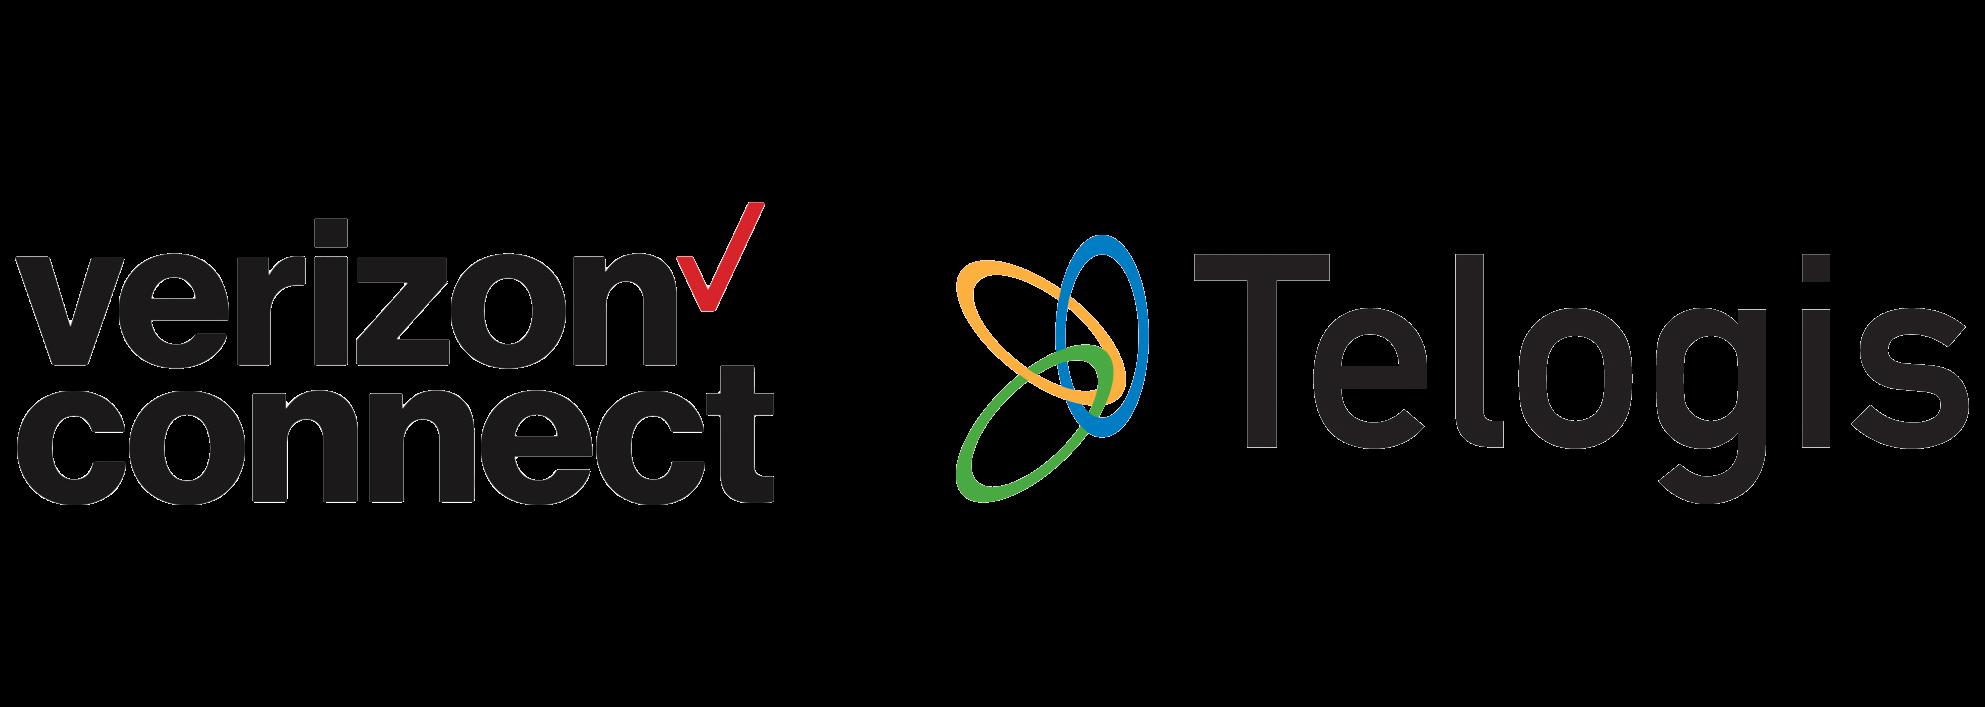 Verizon connect and telogis